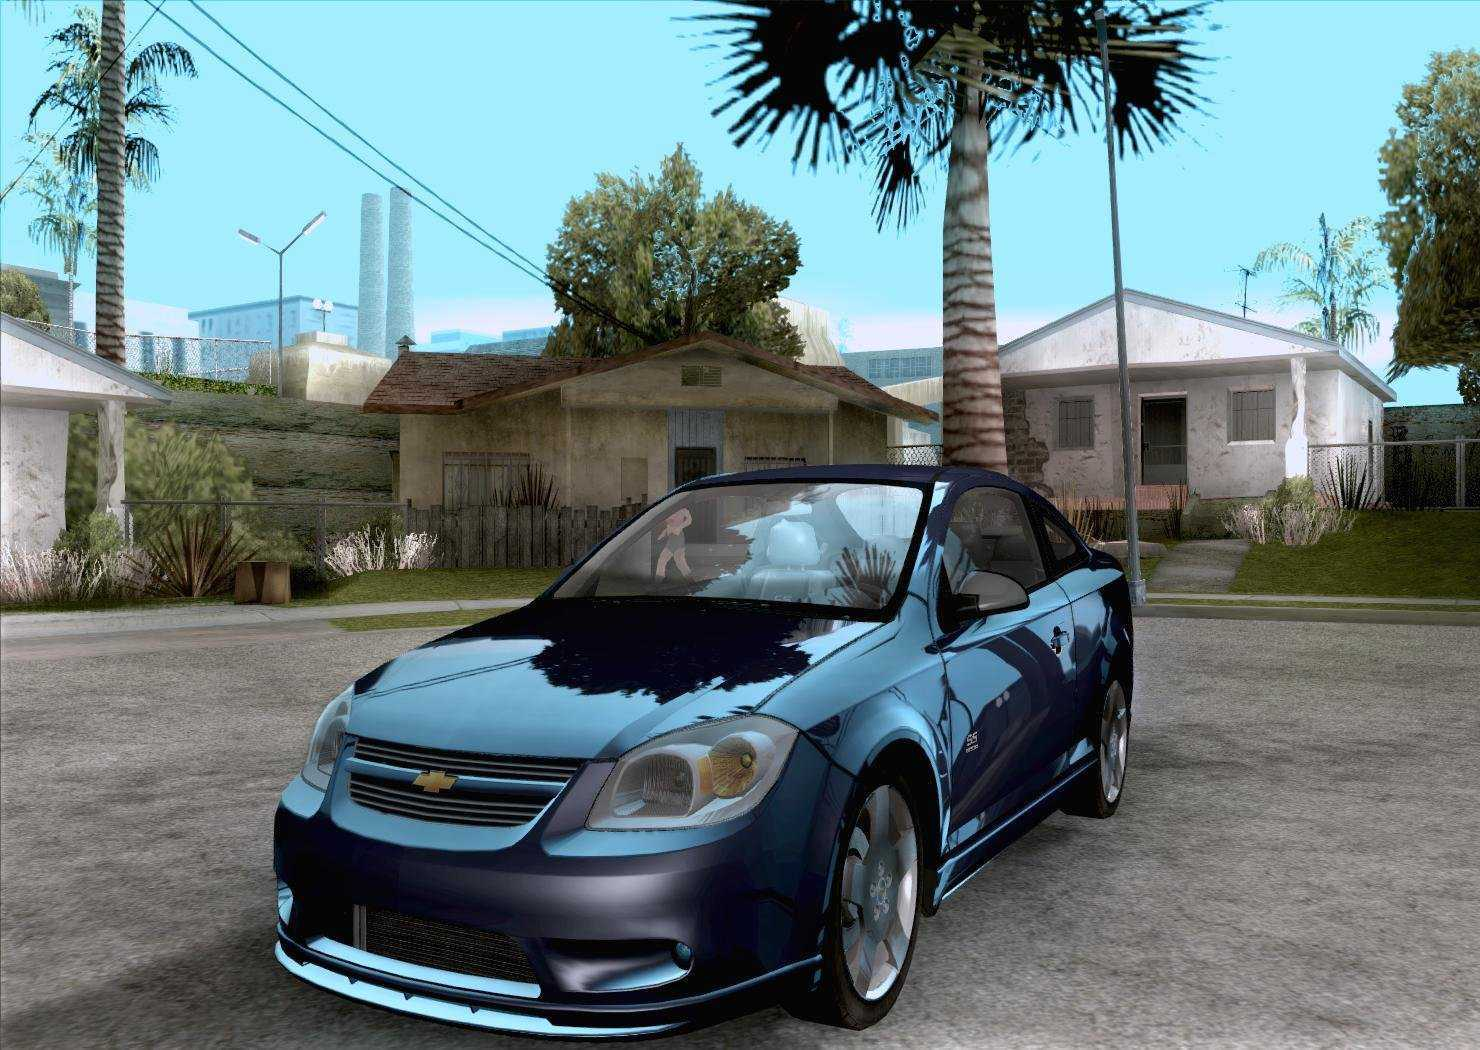 2006 Chevrolet Cobalt >> Chevrolet Cobalt SS Modification - Car Modification